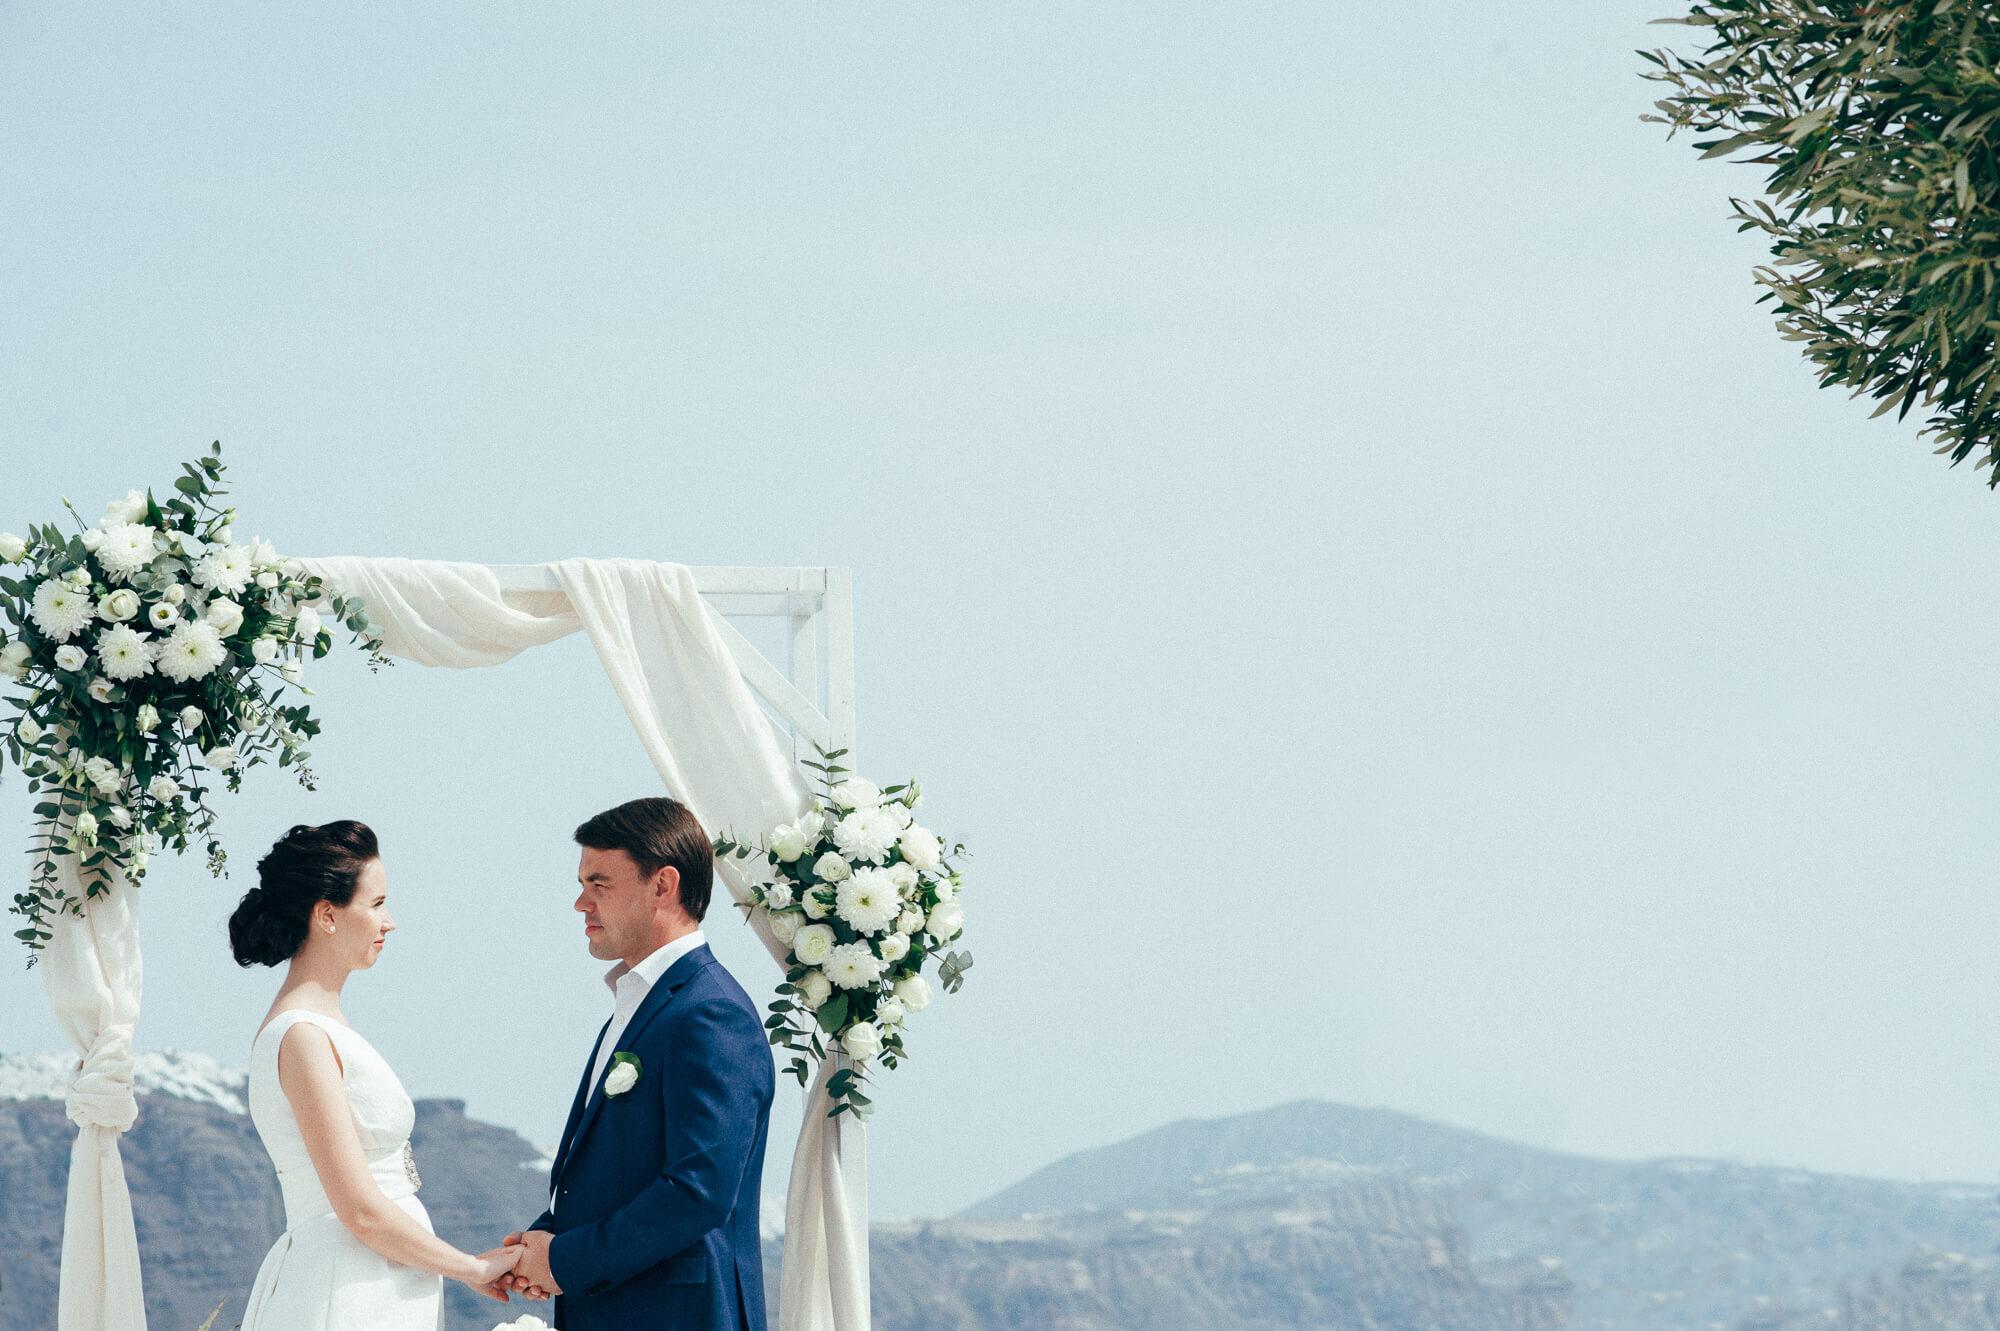 manes-wedding-photographer-greece-121